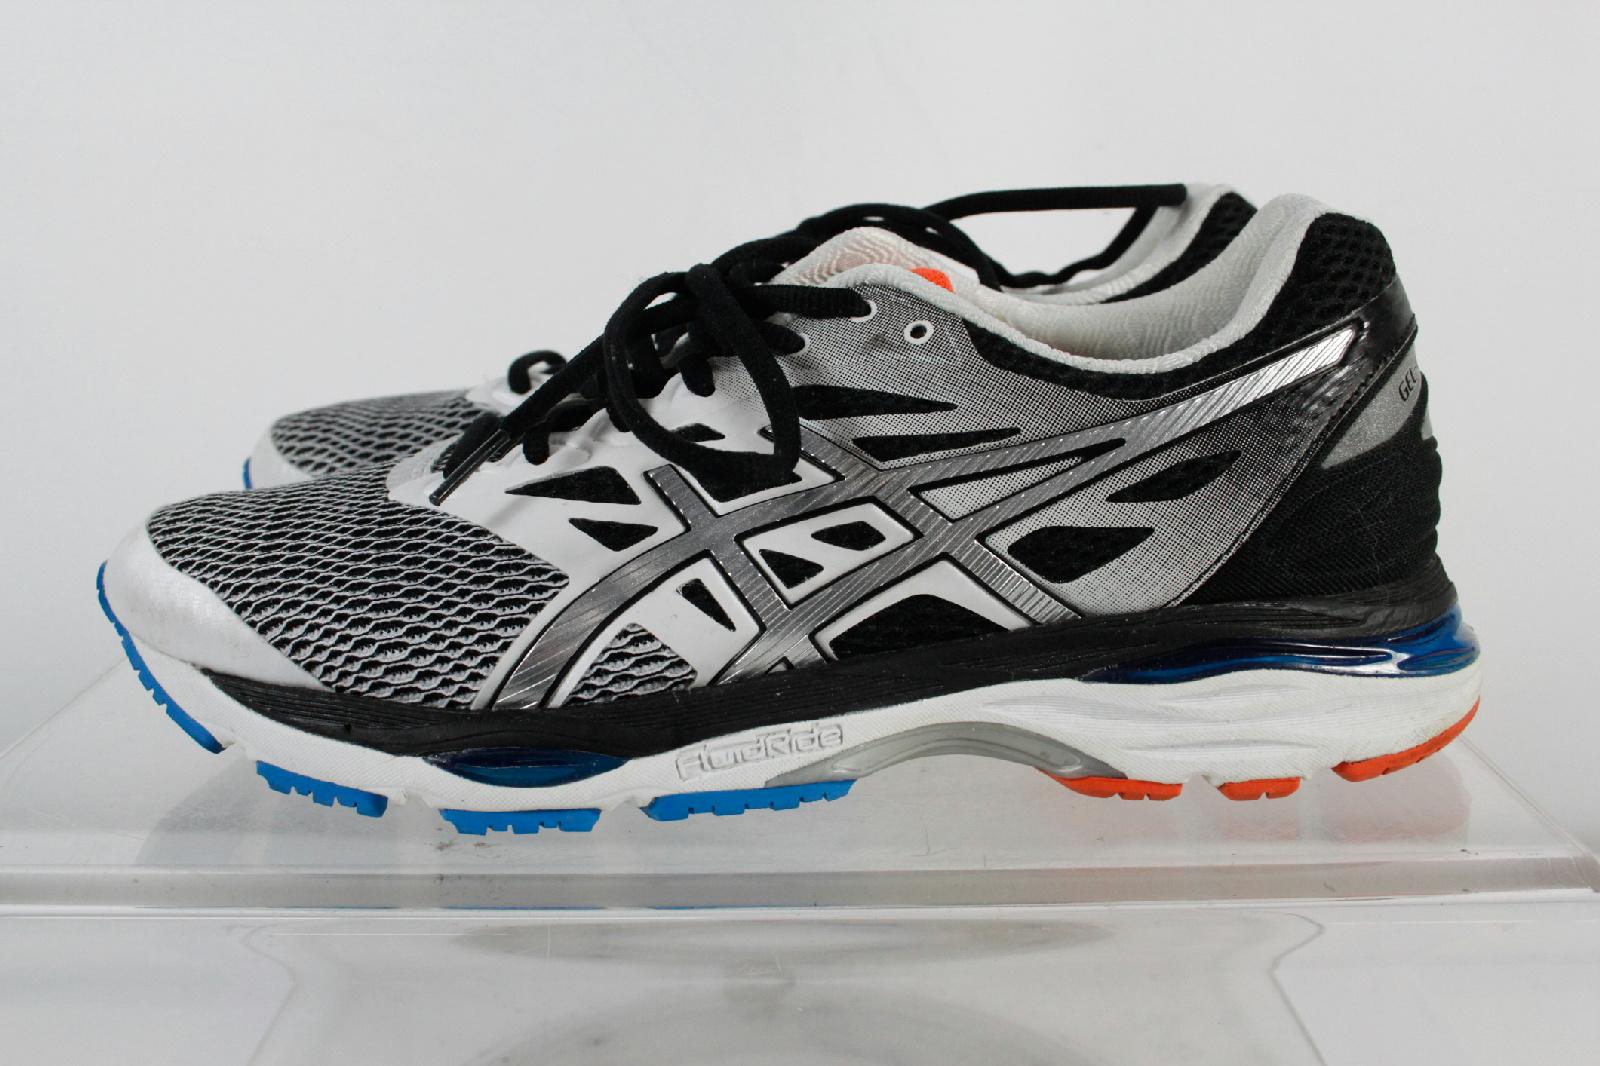 Widest Toe Box Running Shoe